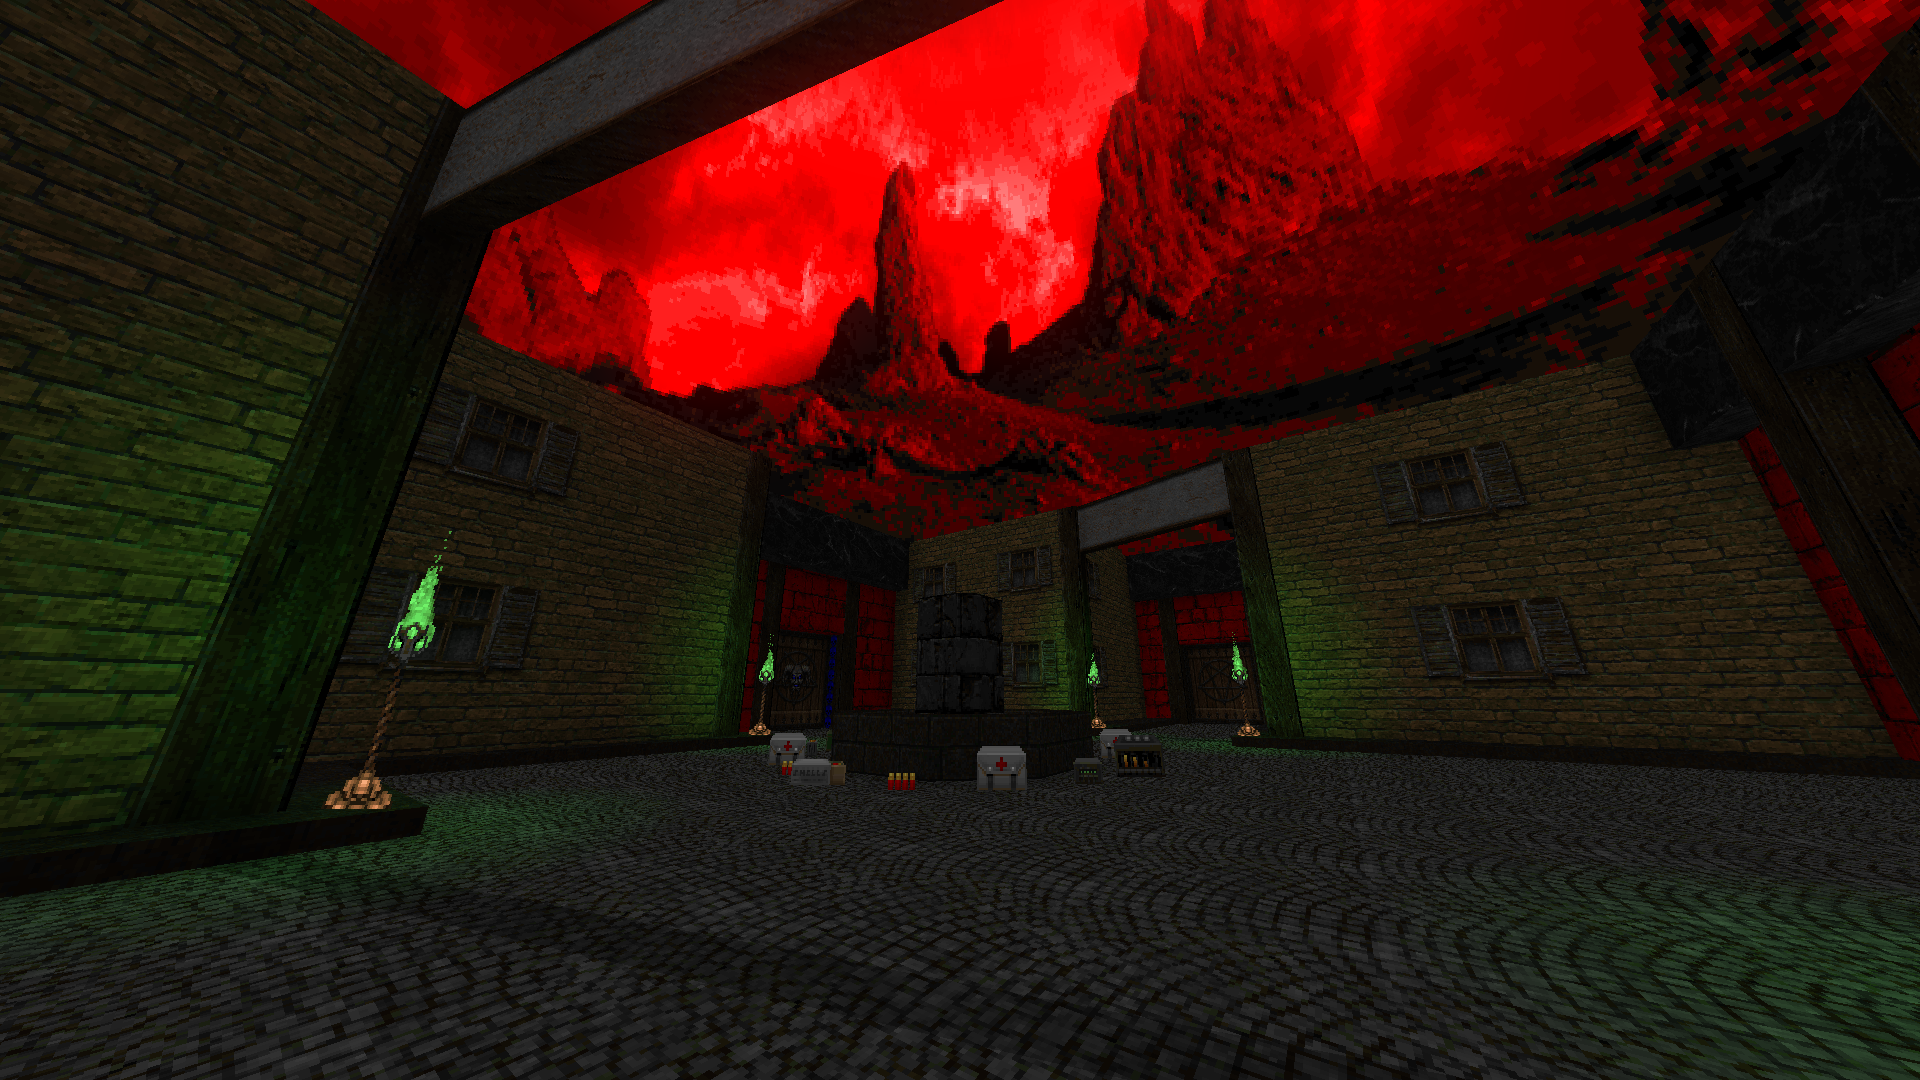 Screenshot_Doom_20210222_164018.png.f9e8411d05a25fc1d381063b5ece4d5d.png